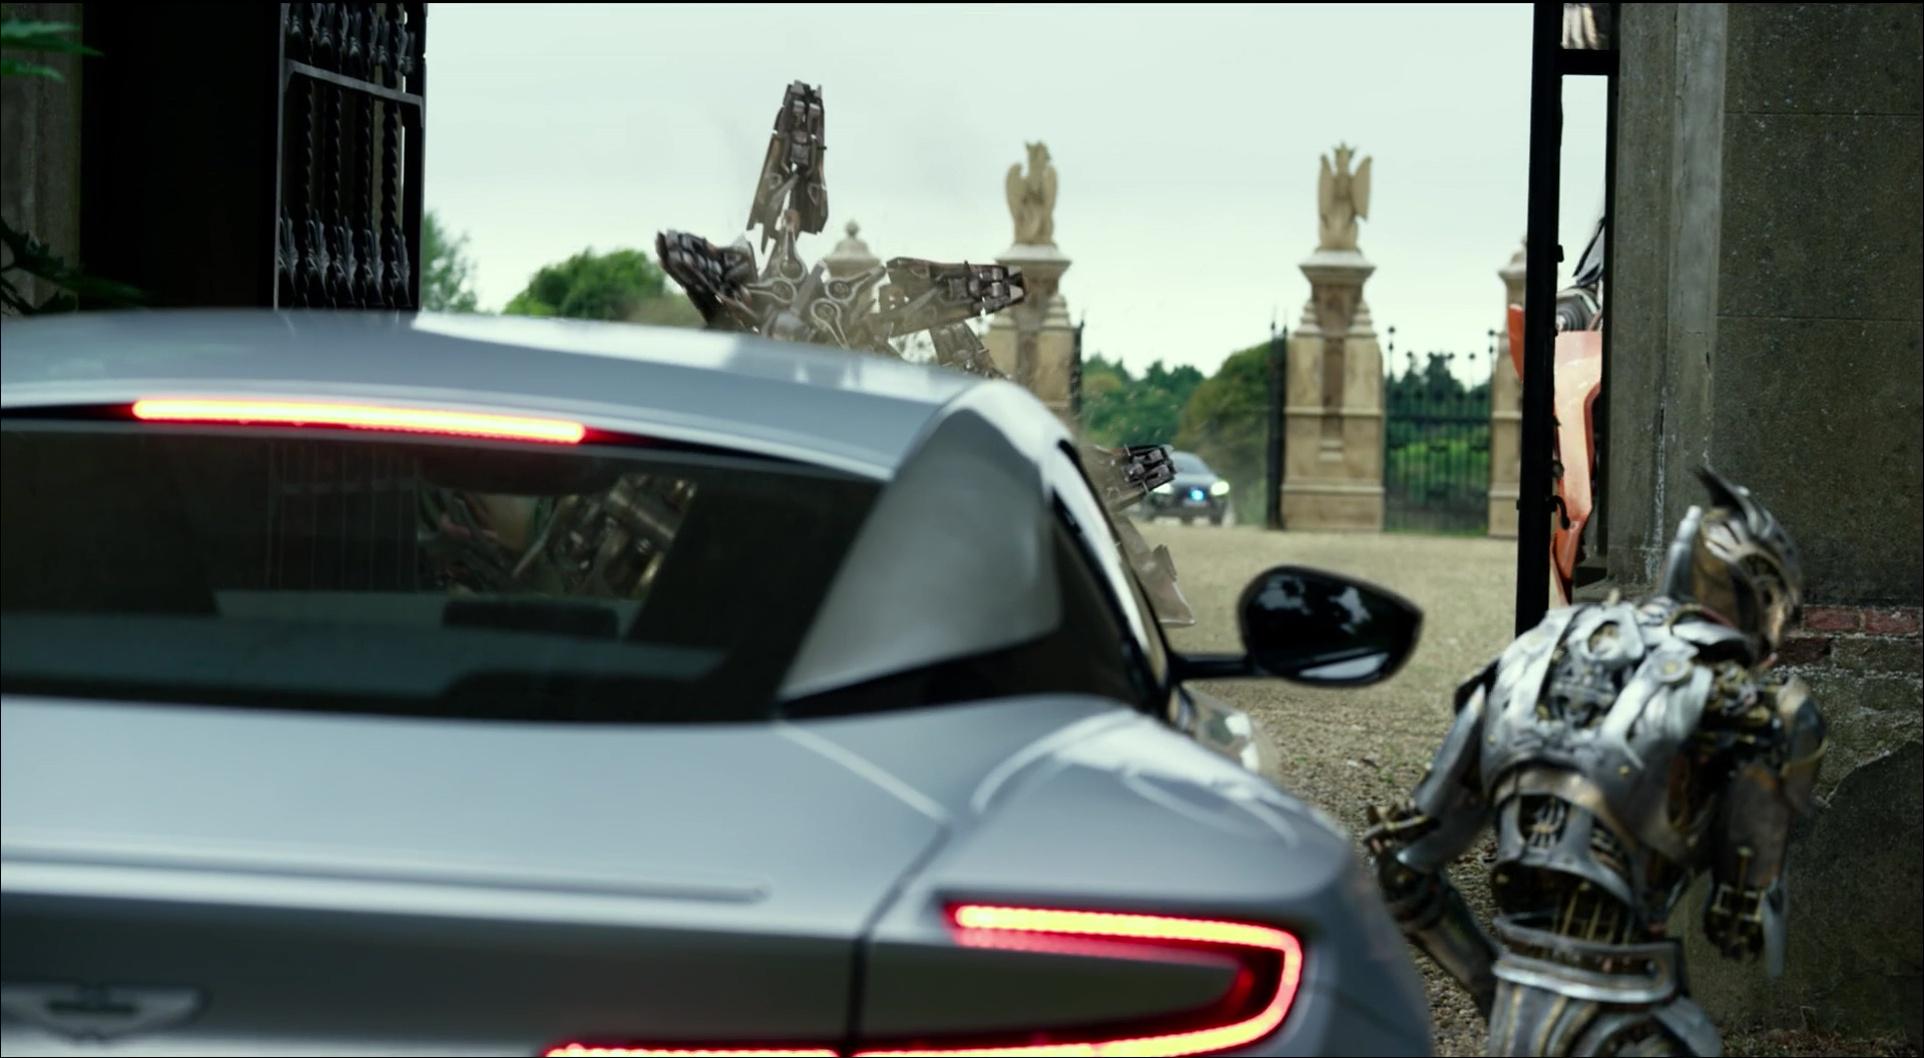 Silver Aston Martin Db11 In Transformers 5 The Last Knight 2017